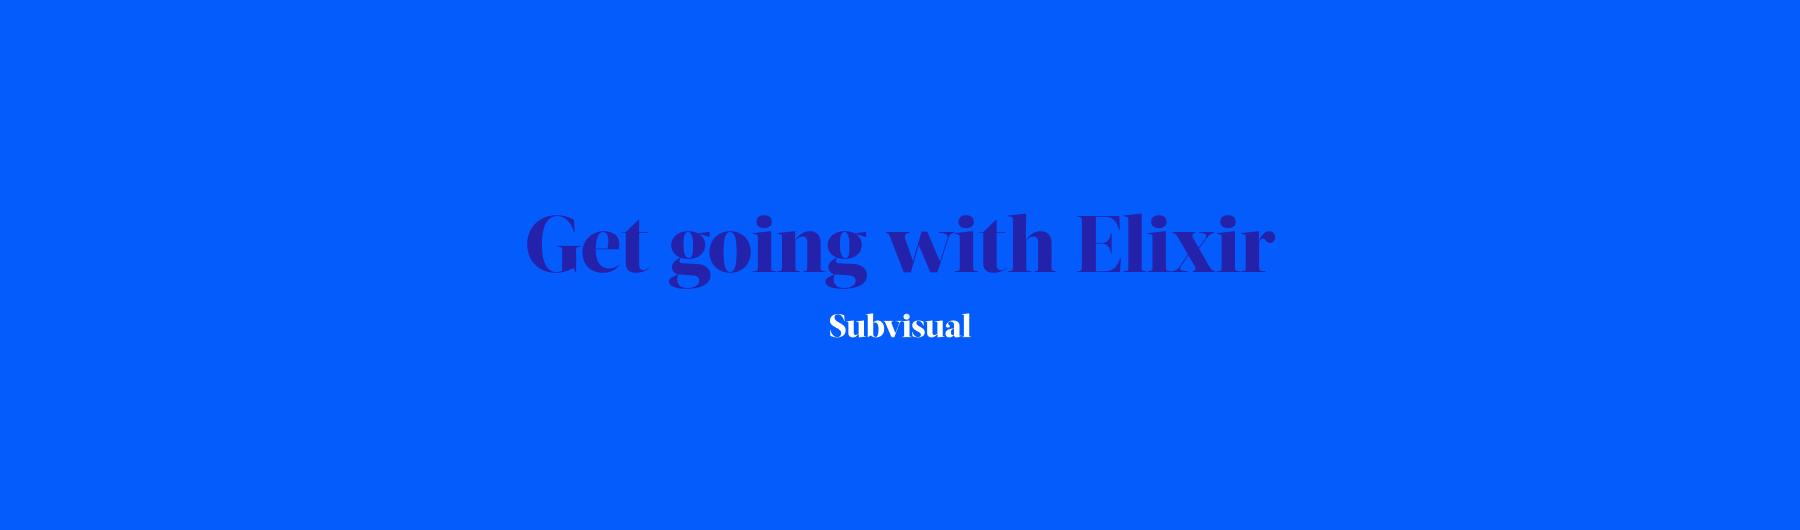 Get going with Elixir